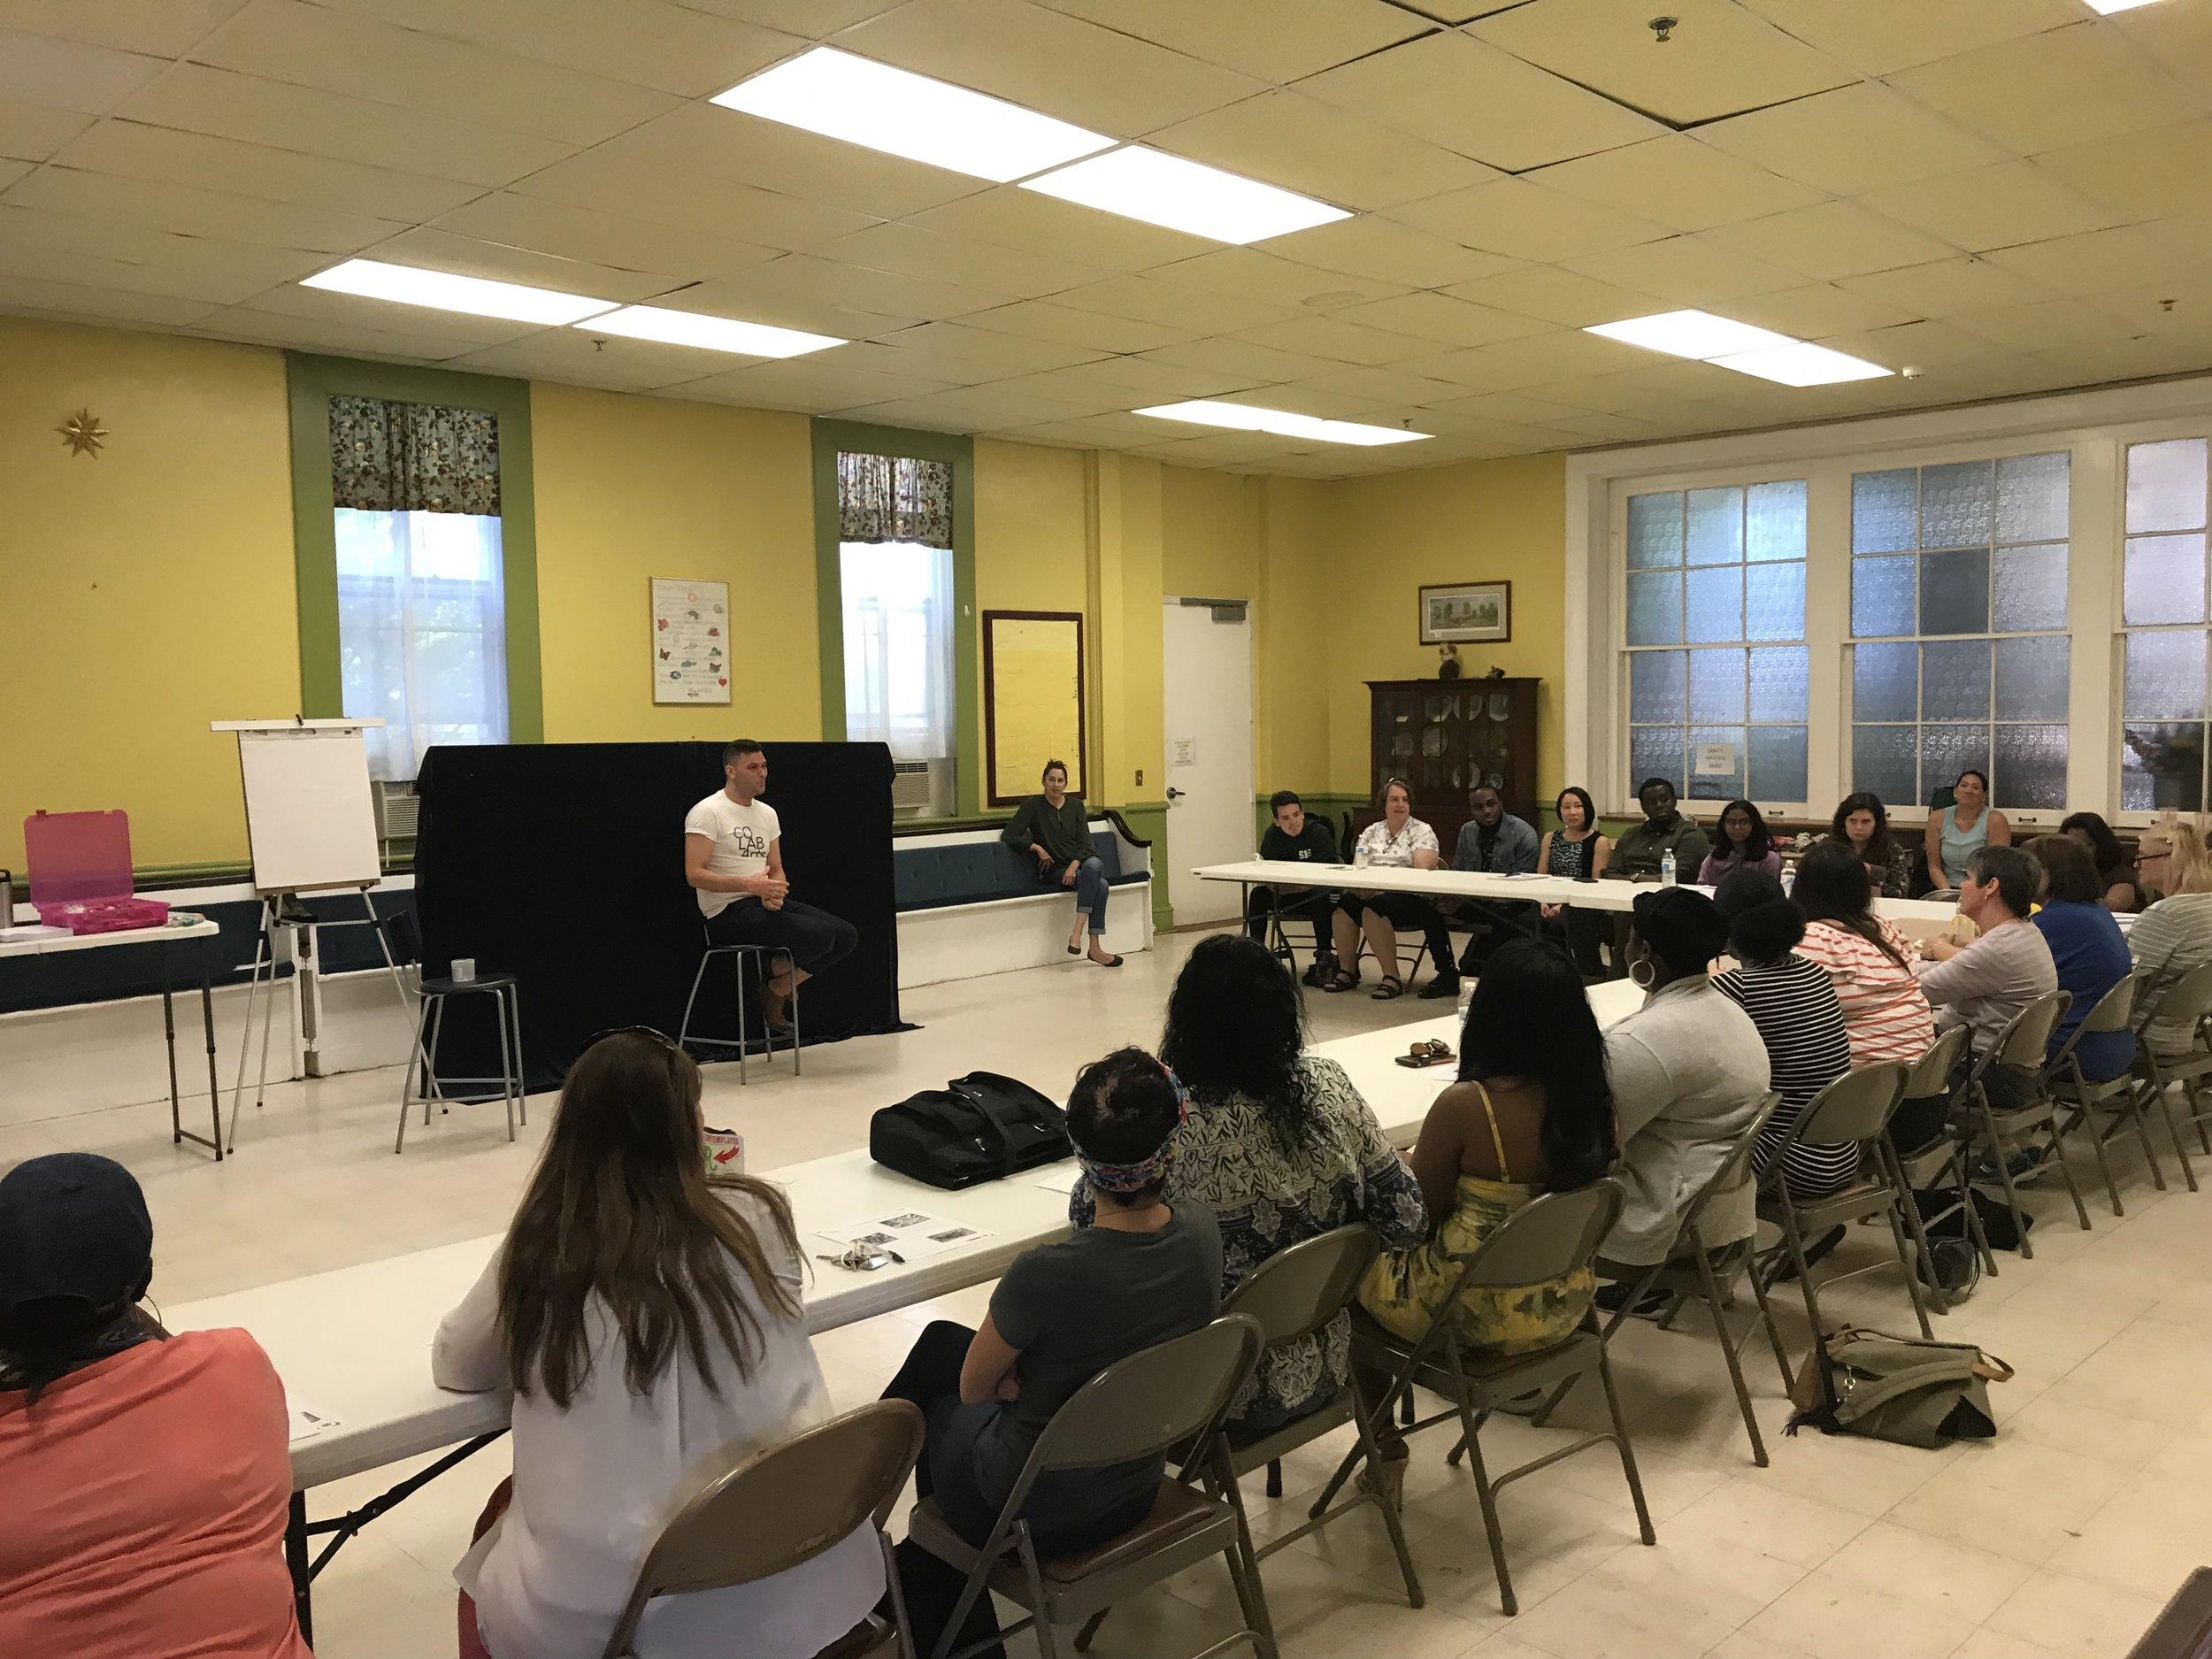 Lead teaching artist Dustin Ballard conducting a community workshop.